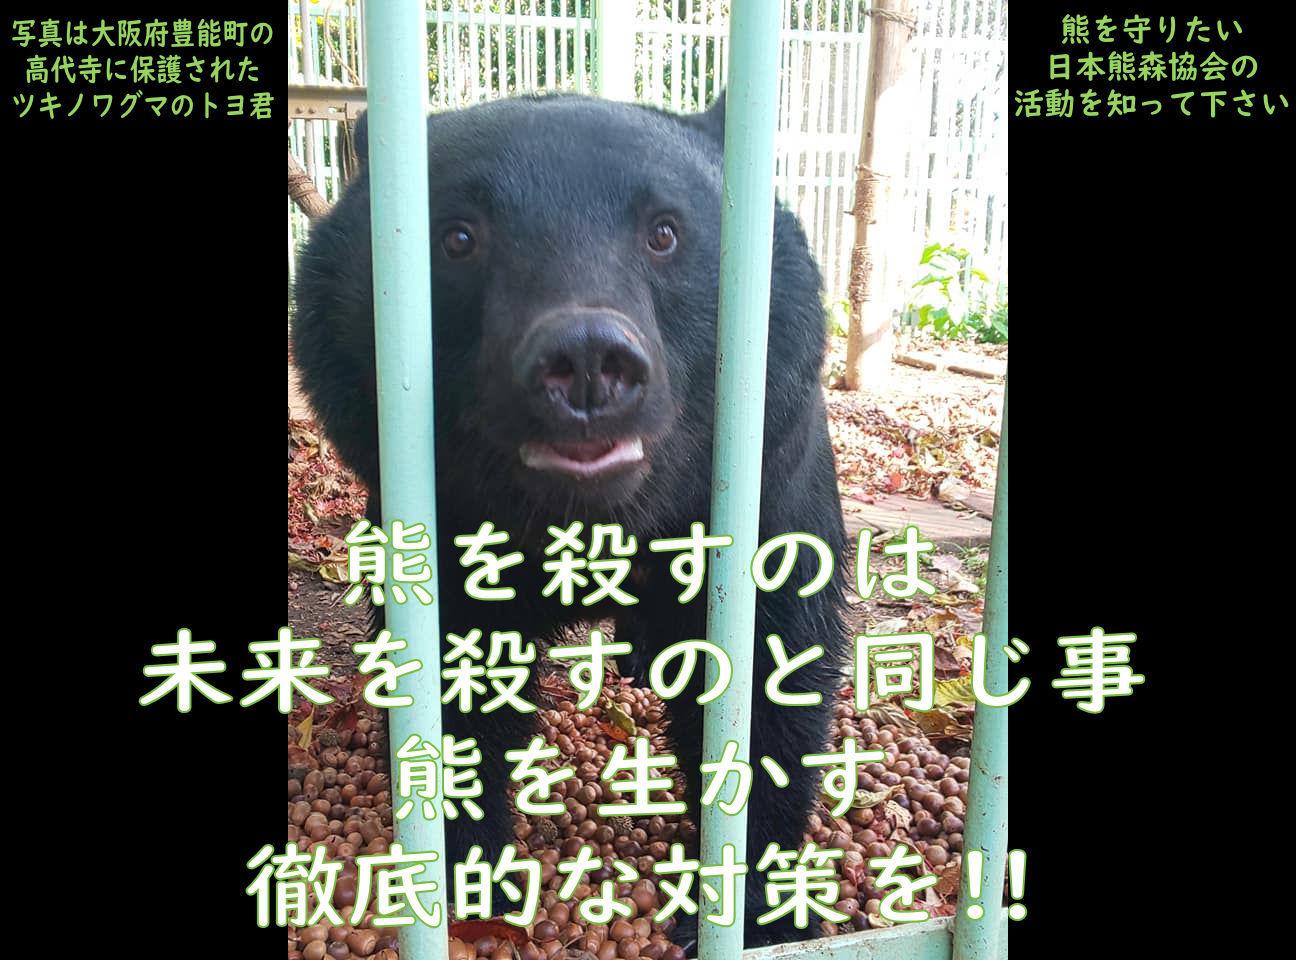 TOYO20201117A.jpg